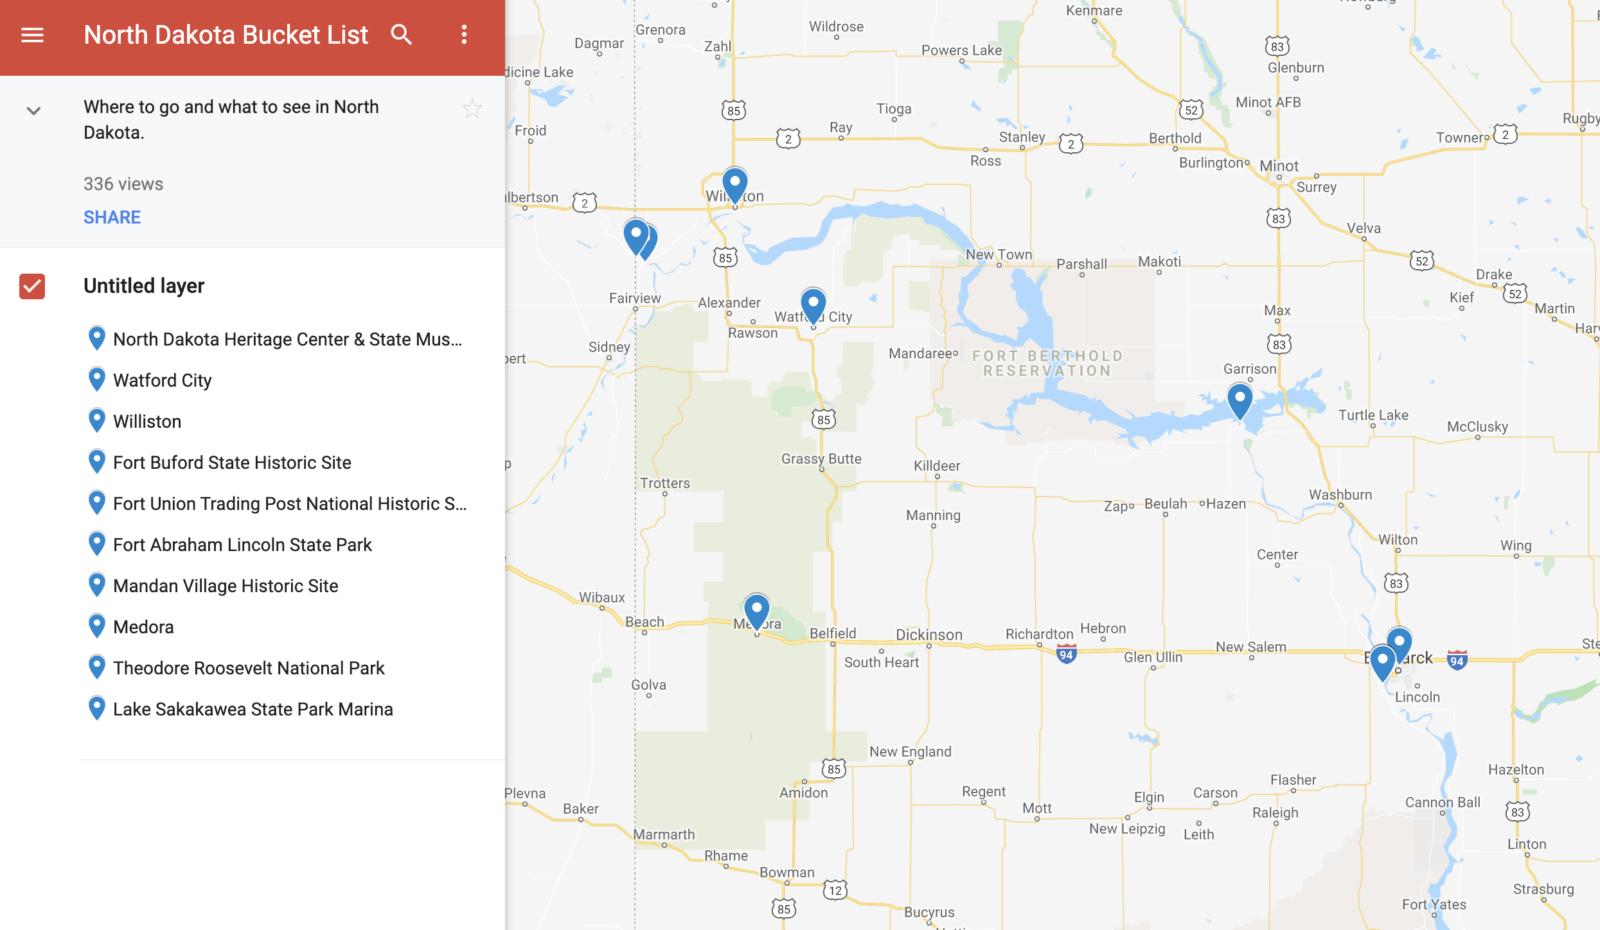 North Dakota Bucket List Map